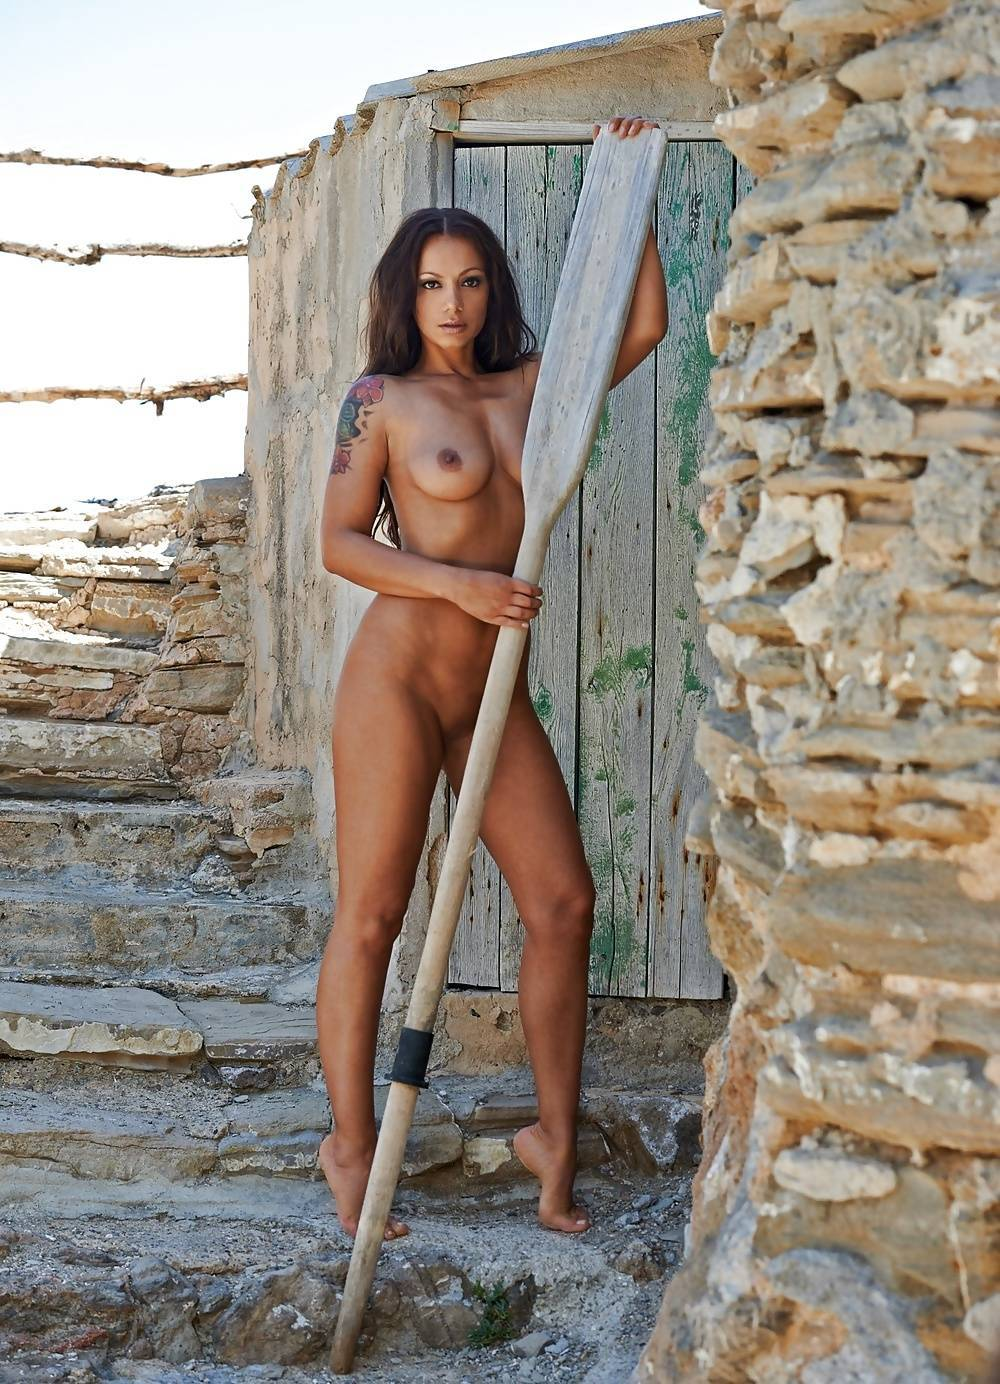 Naked radost bokel Naked Pictures